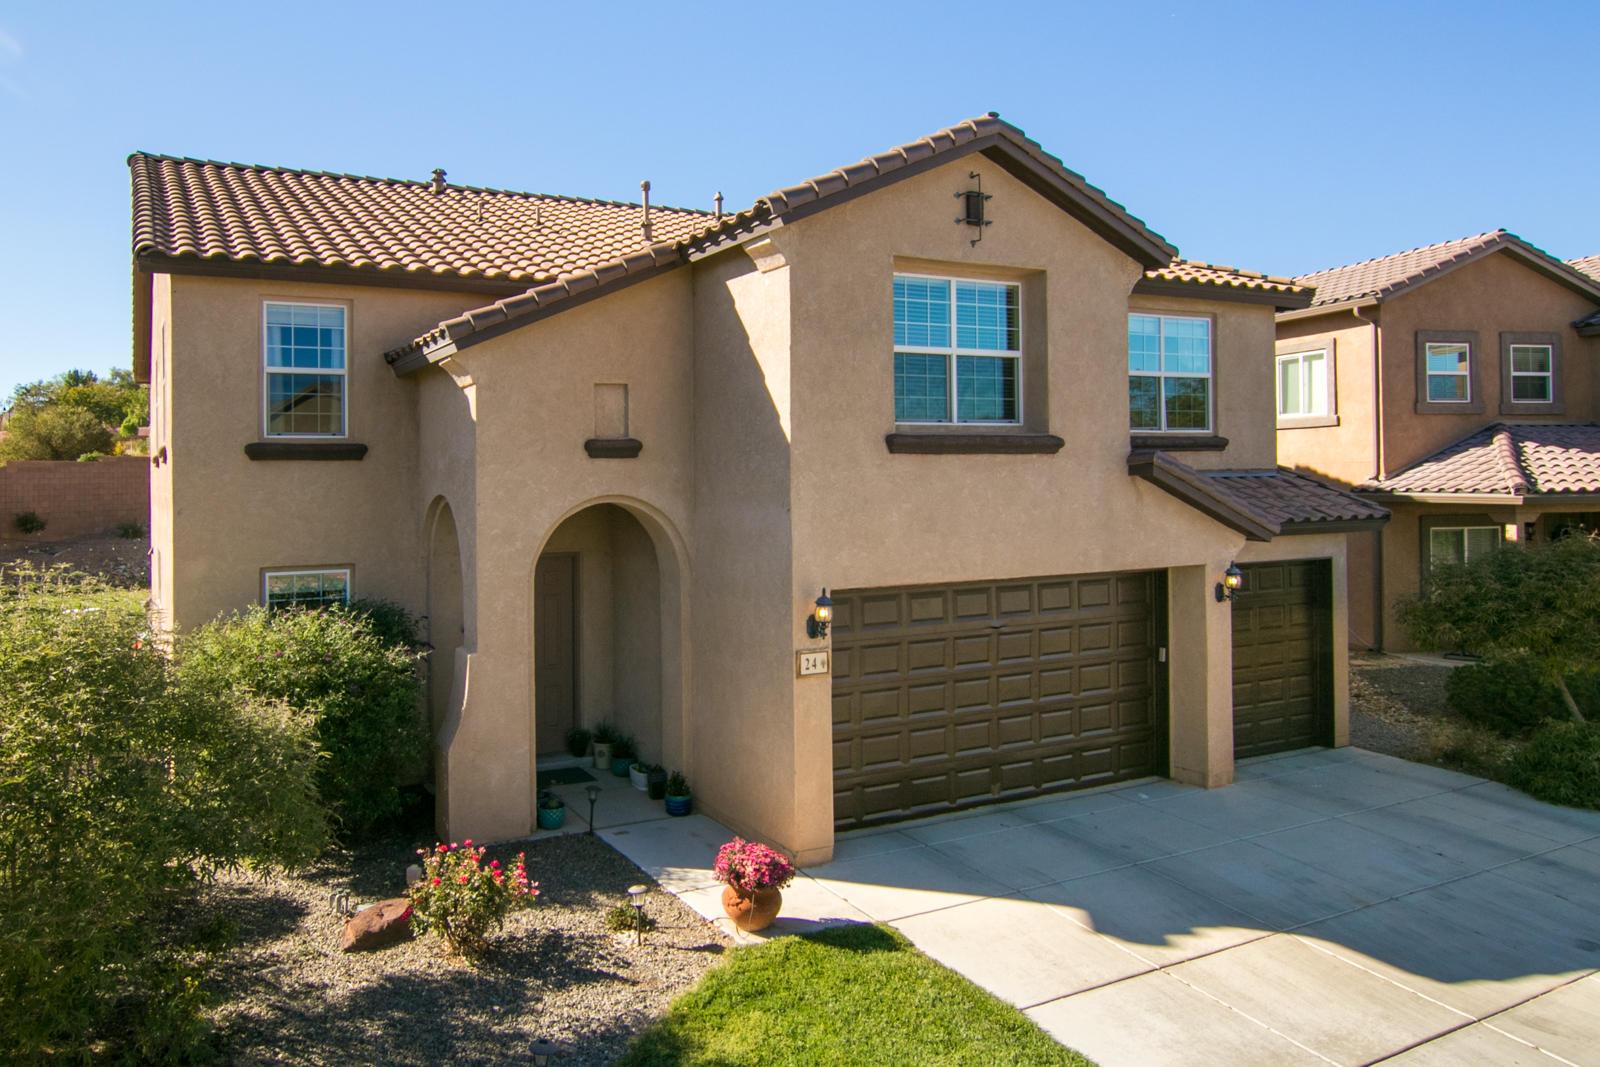 24 Paseo Vista,Rio Rancho,New Mexico,United States 87124,5 Bedrooms Bedrooms,4 BathroomsBathrooms,Residential,Paseo Vista,929757